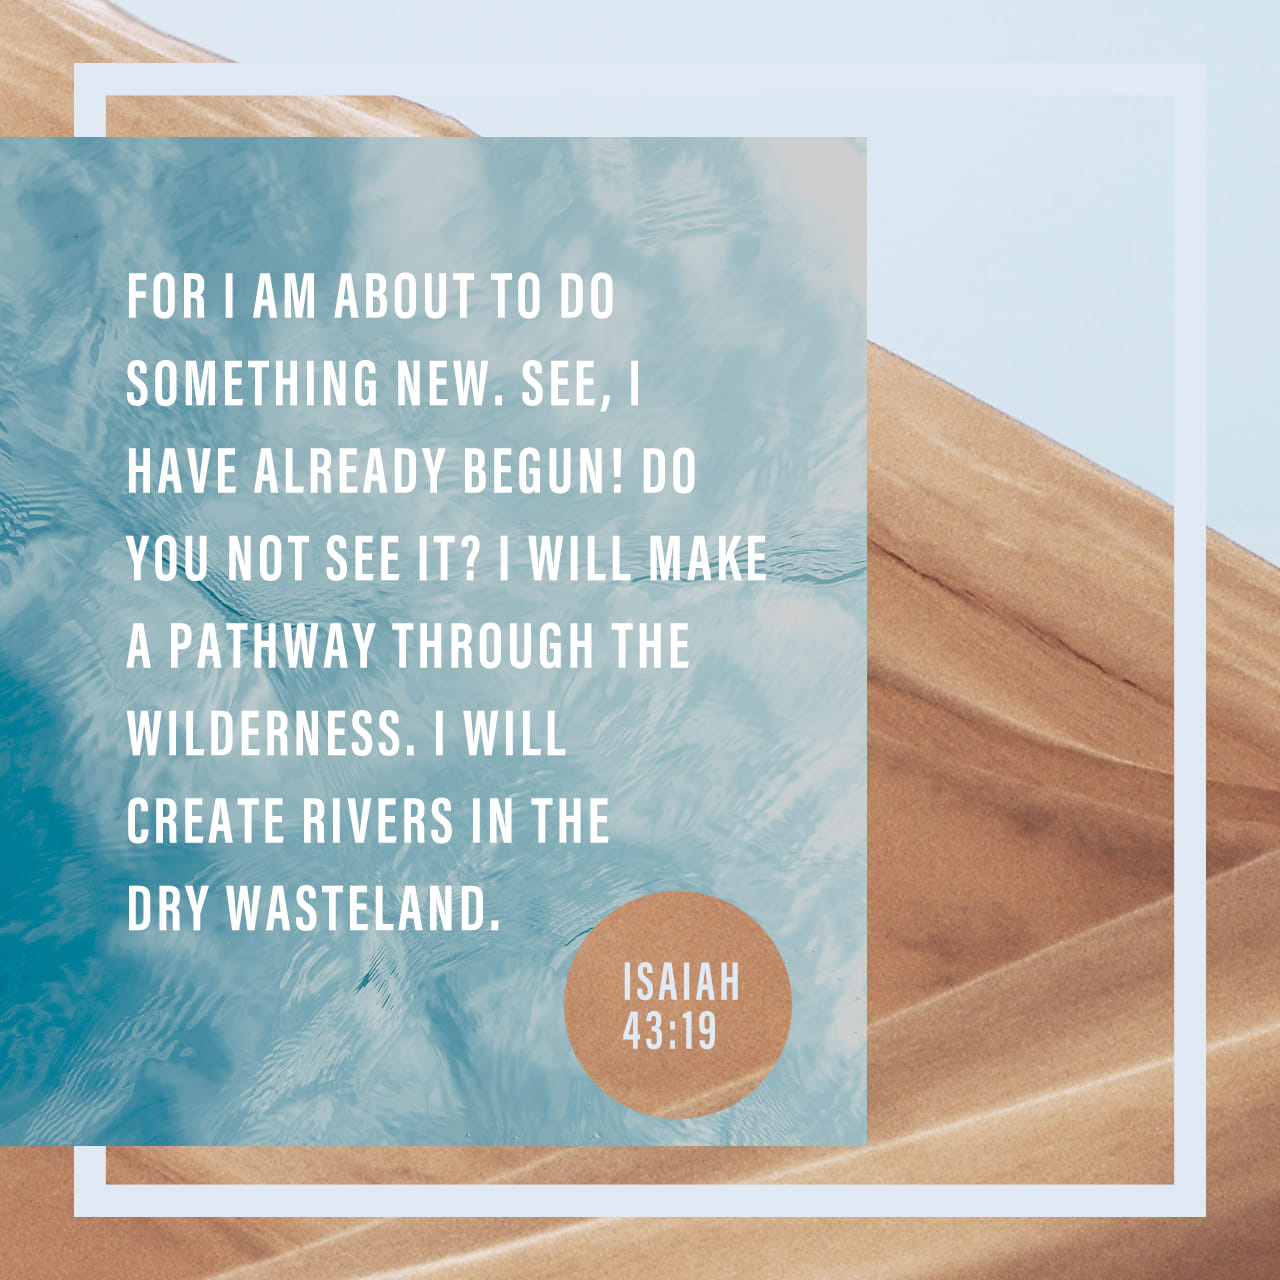 Isaiah 43:18–19